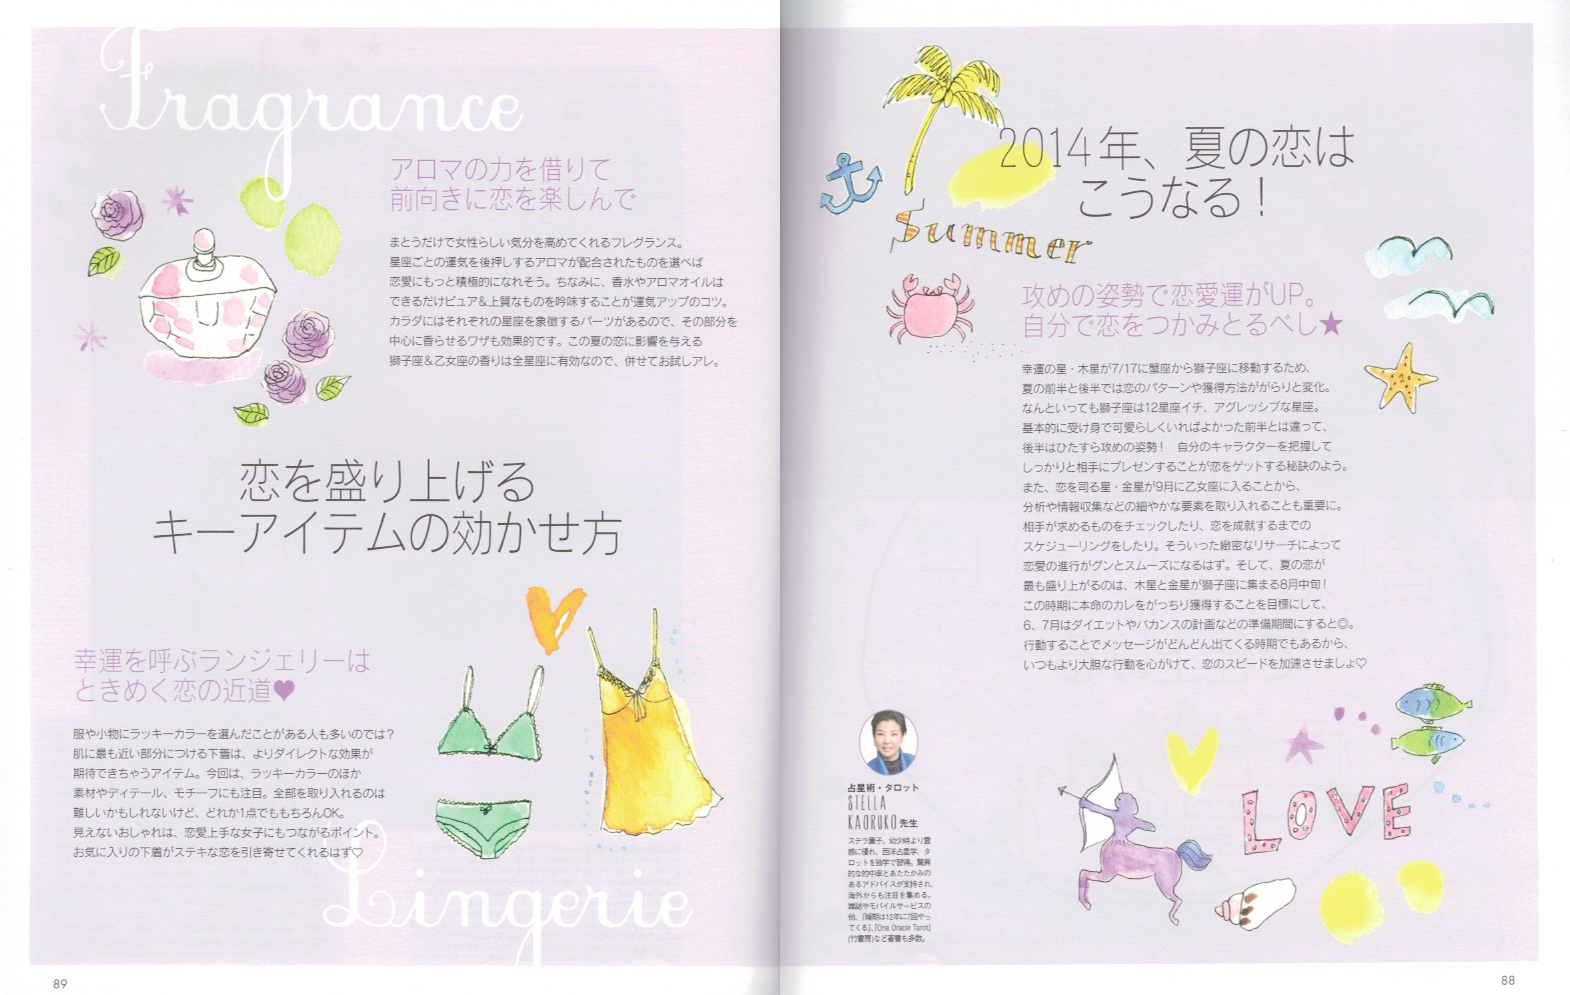 Shunme2014july_2